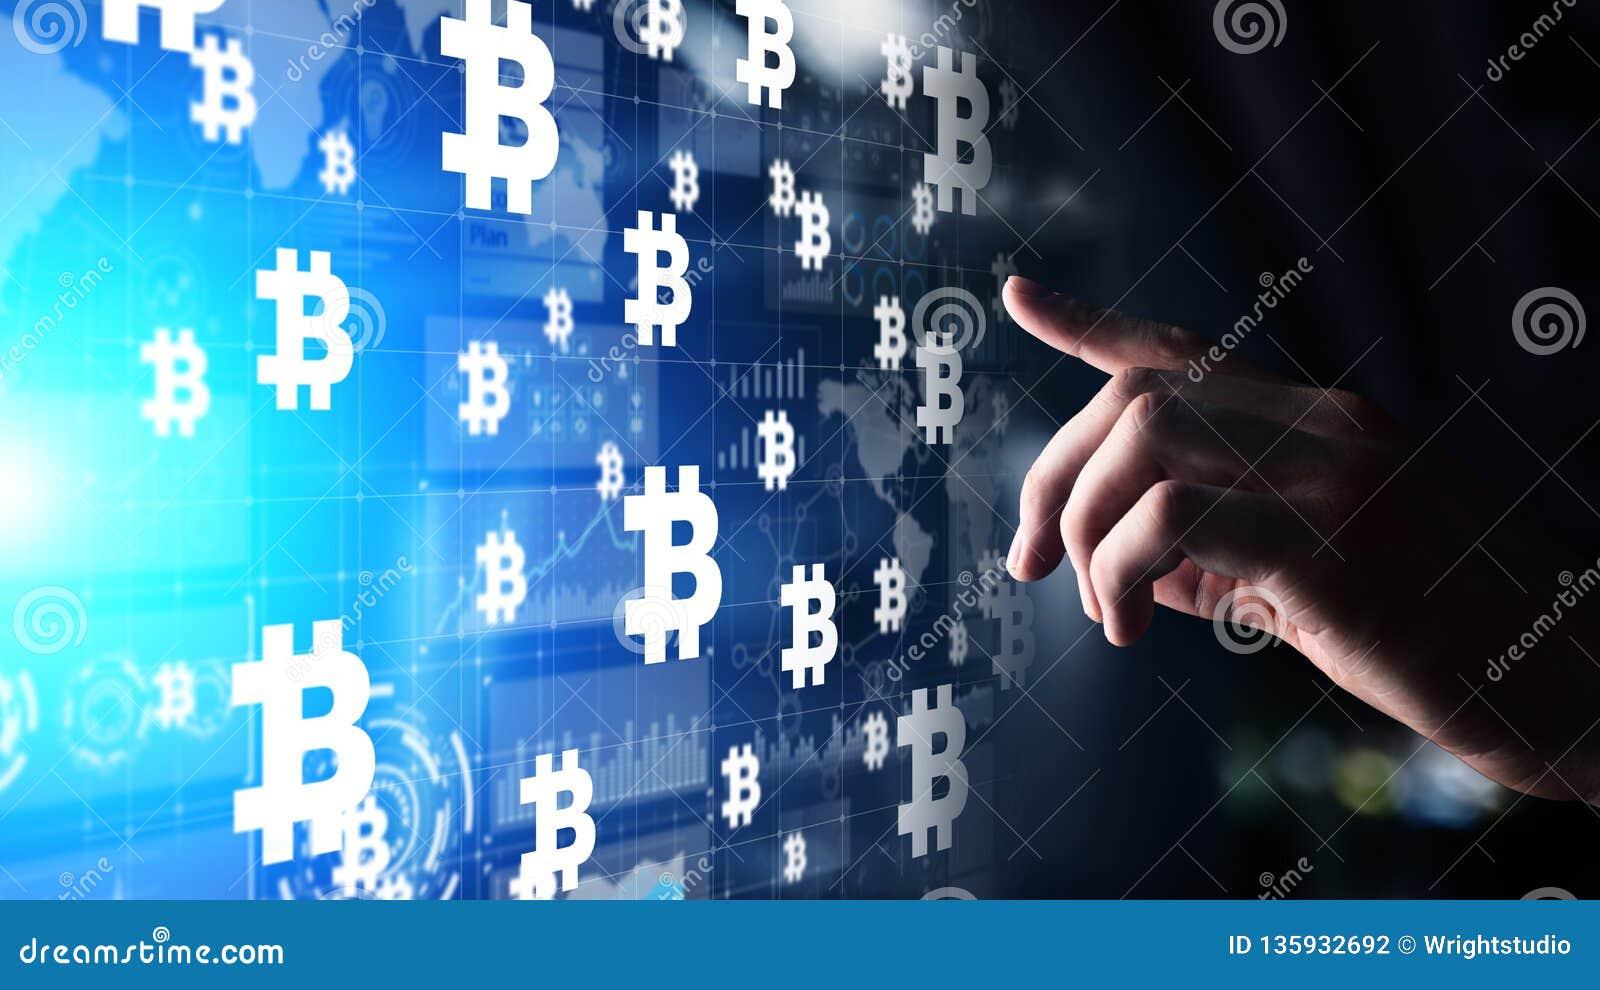 jigsaw trading cryptocurrency